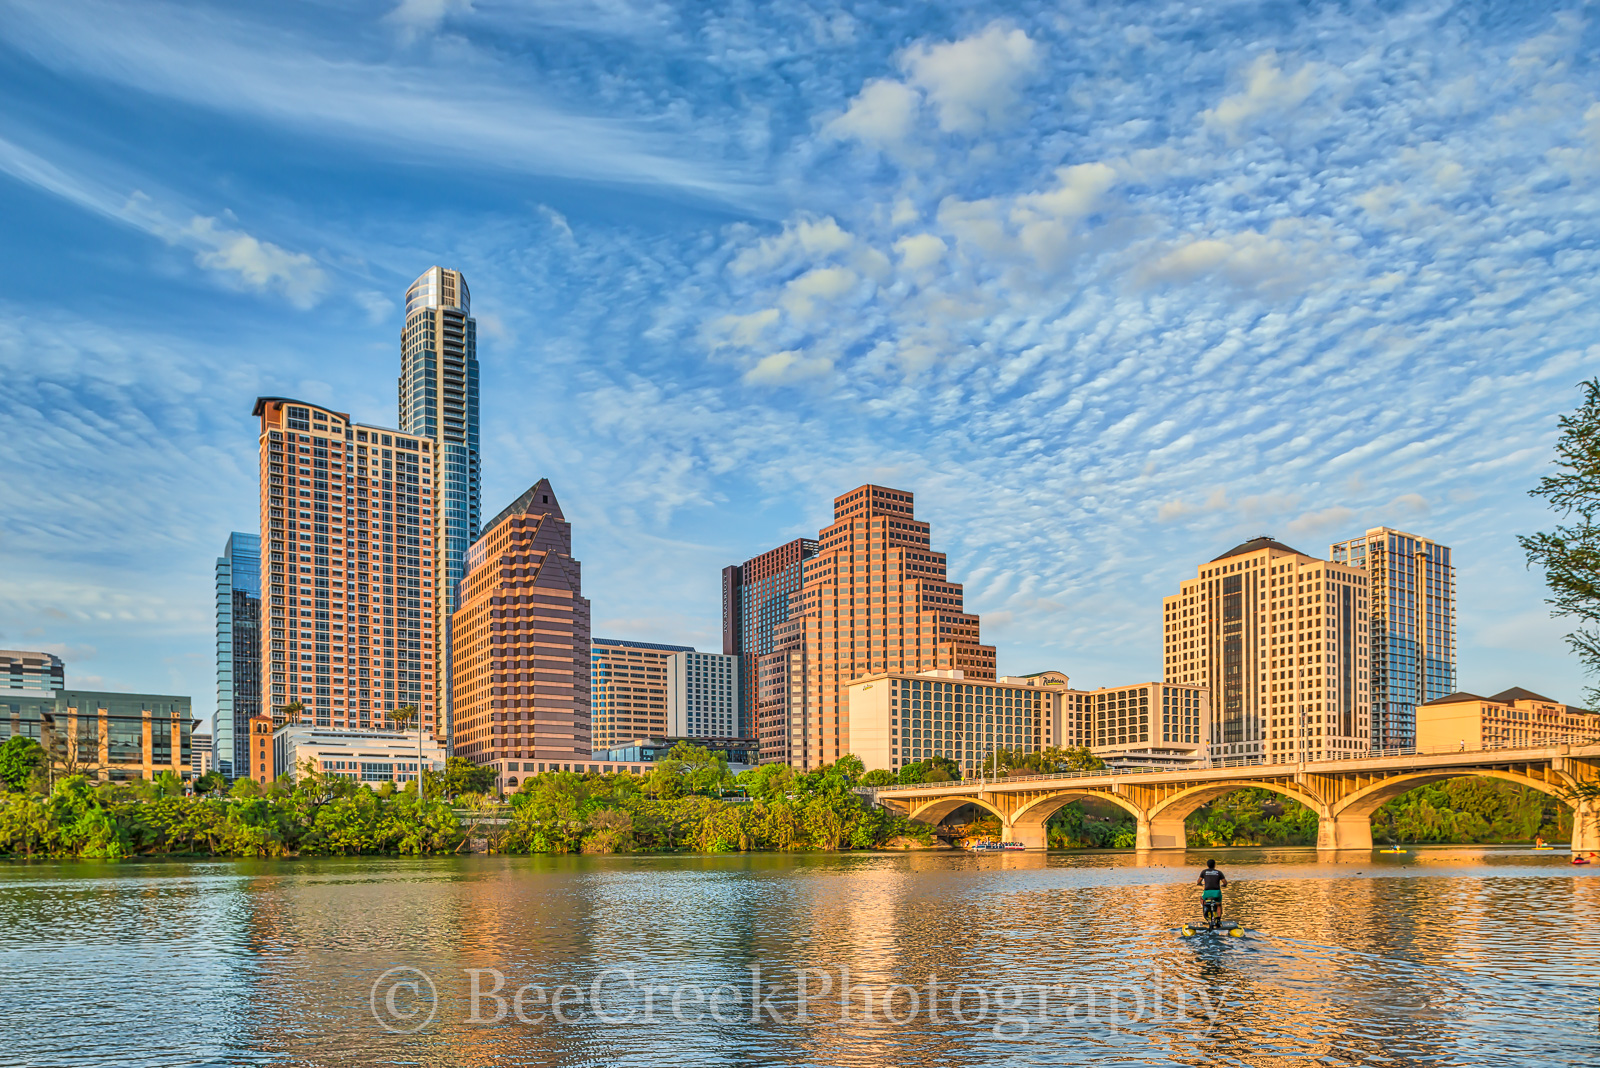 Austin, cityscape, skyline, city, clouds, hike and bike, Ladybird Lake, blue sky, water, bike, congress bridge, bats, town lake, reflections, high rise, skyscapers, clouds, , austin skylines, austin c, photo